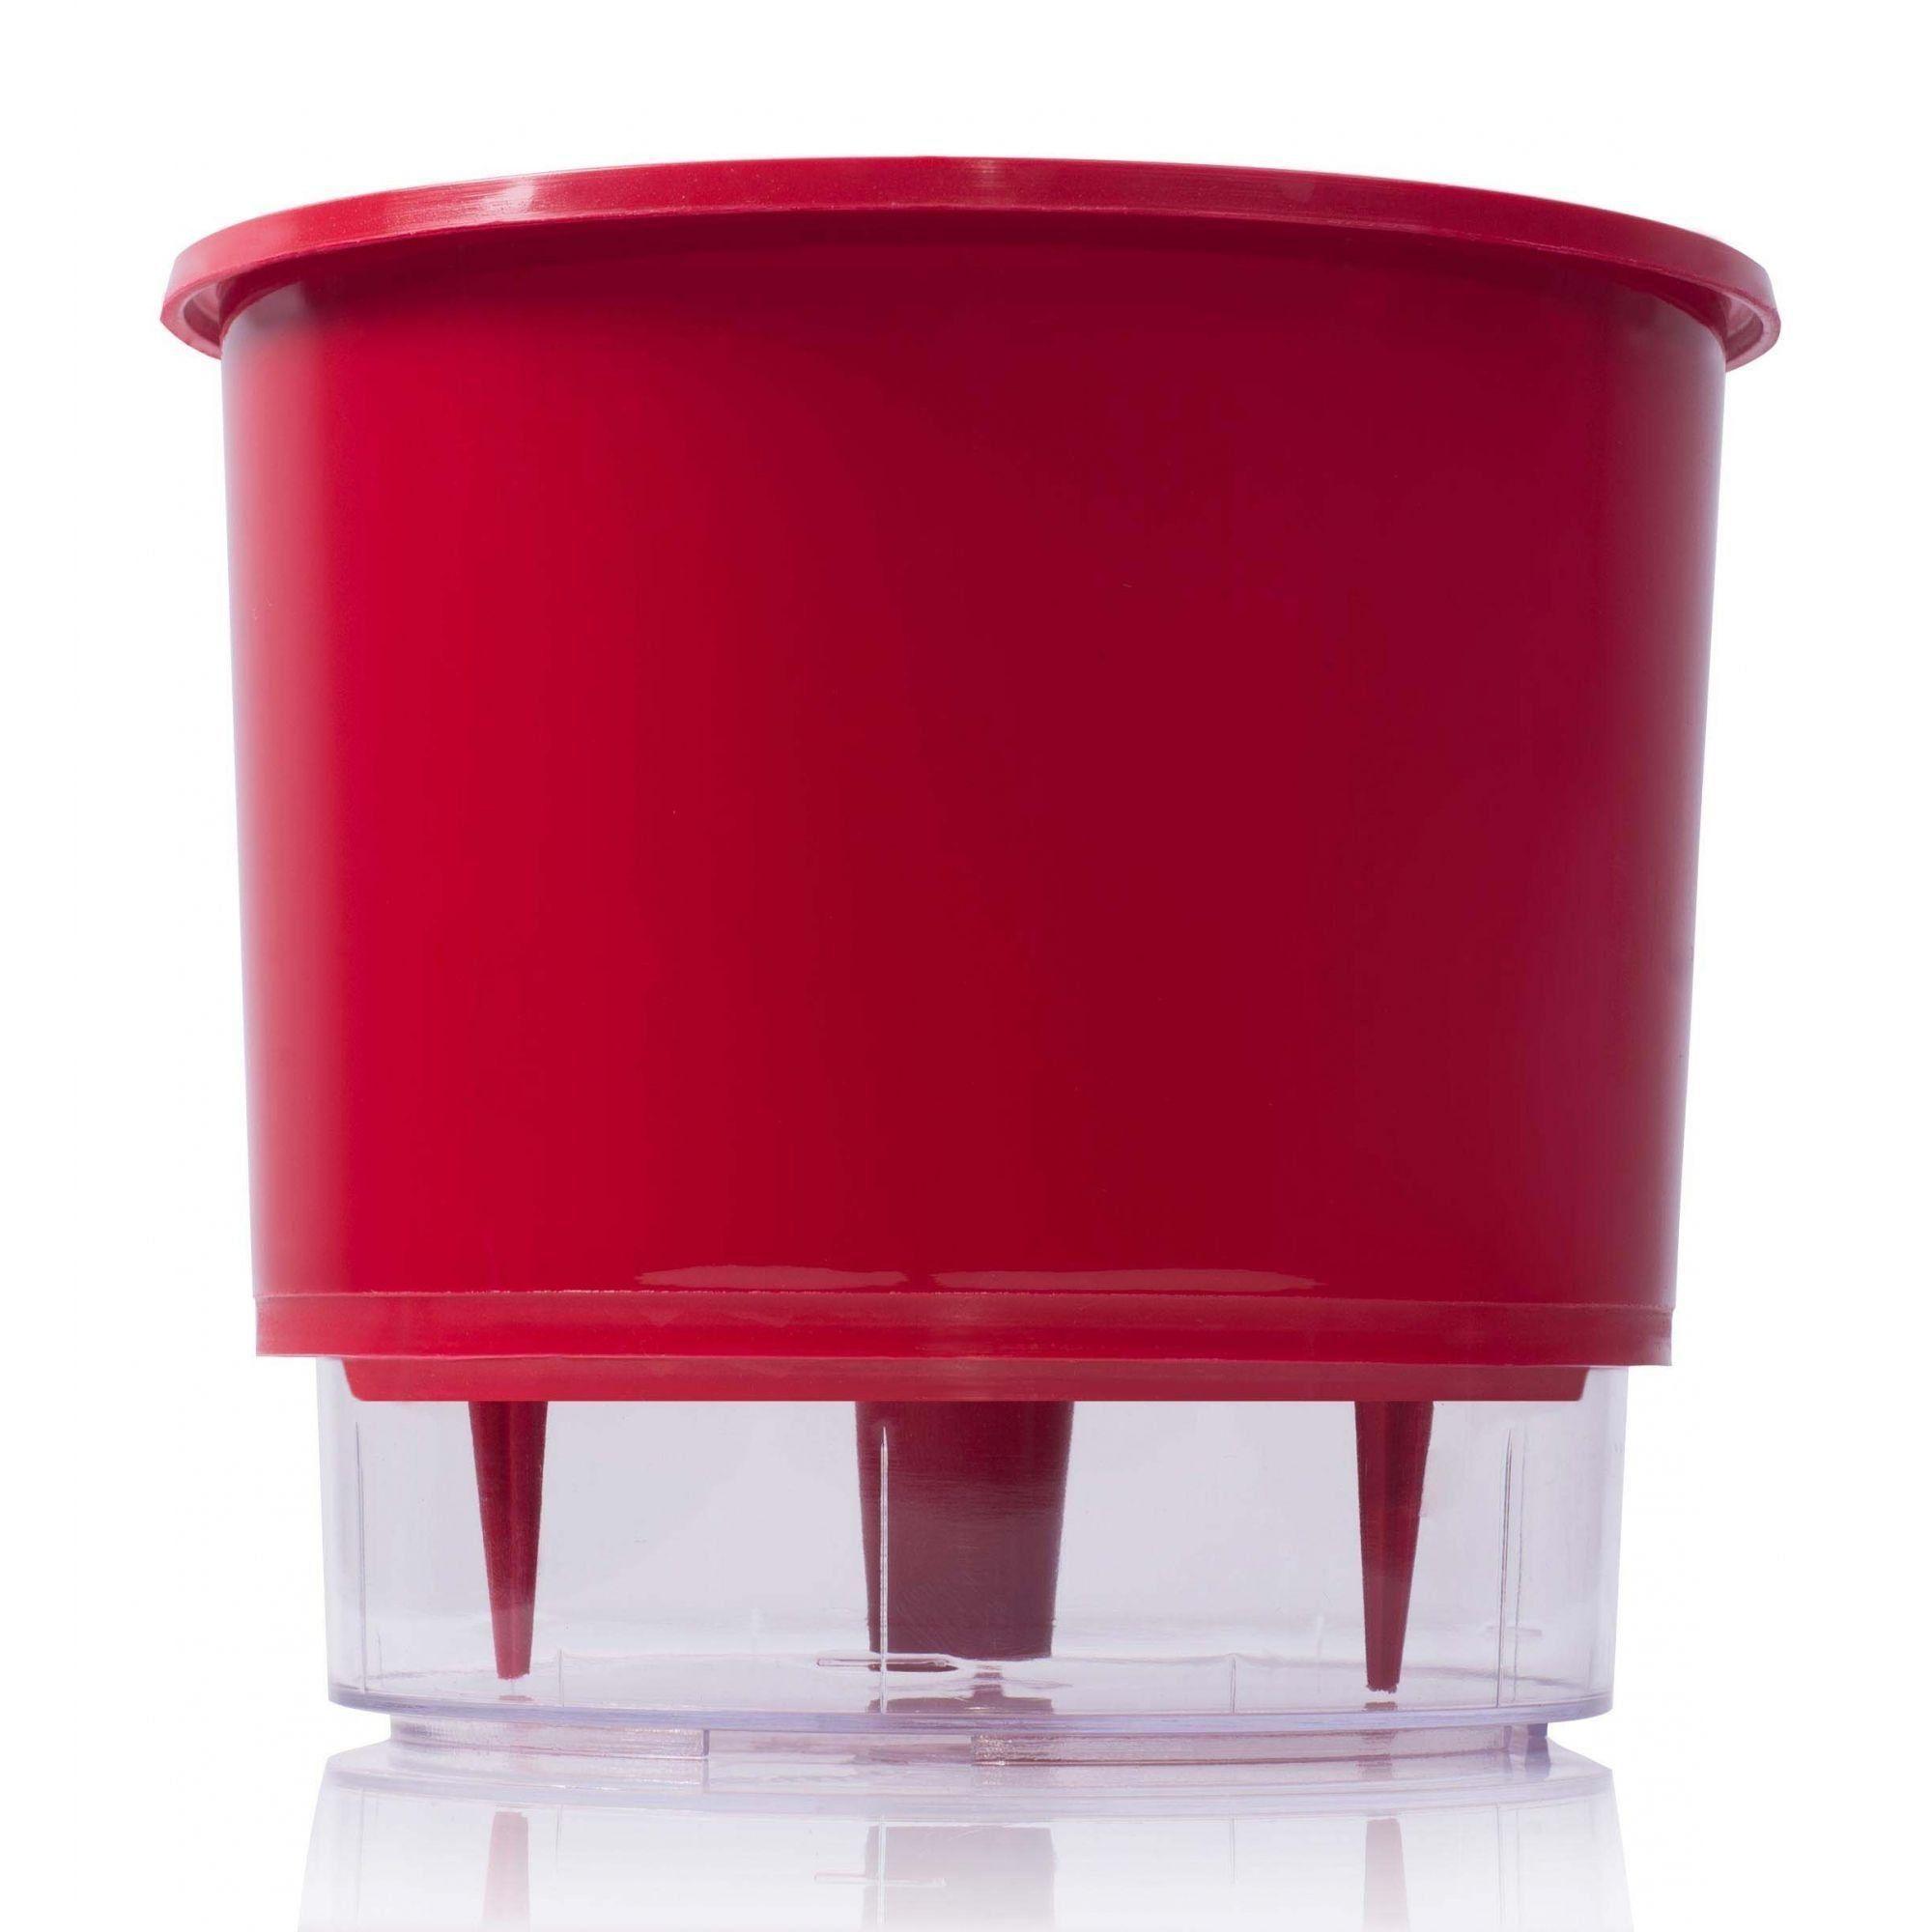 Vaso Autoirrigável Grande 21,5cm x 18cm Vermelho